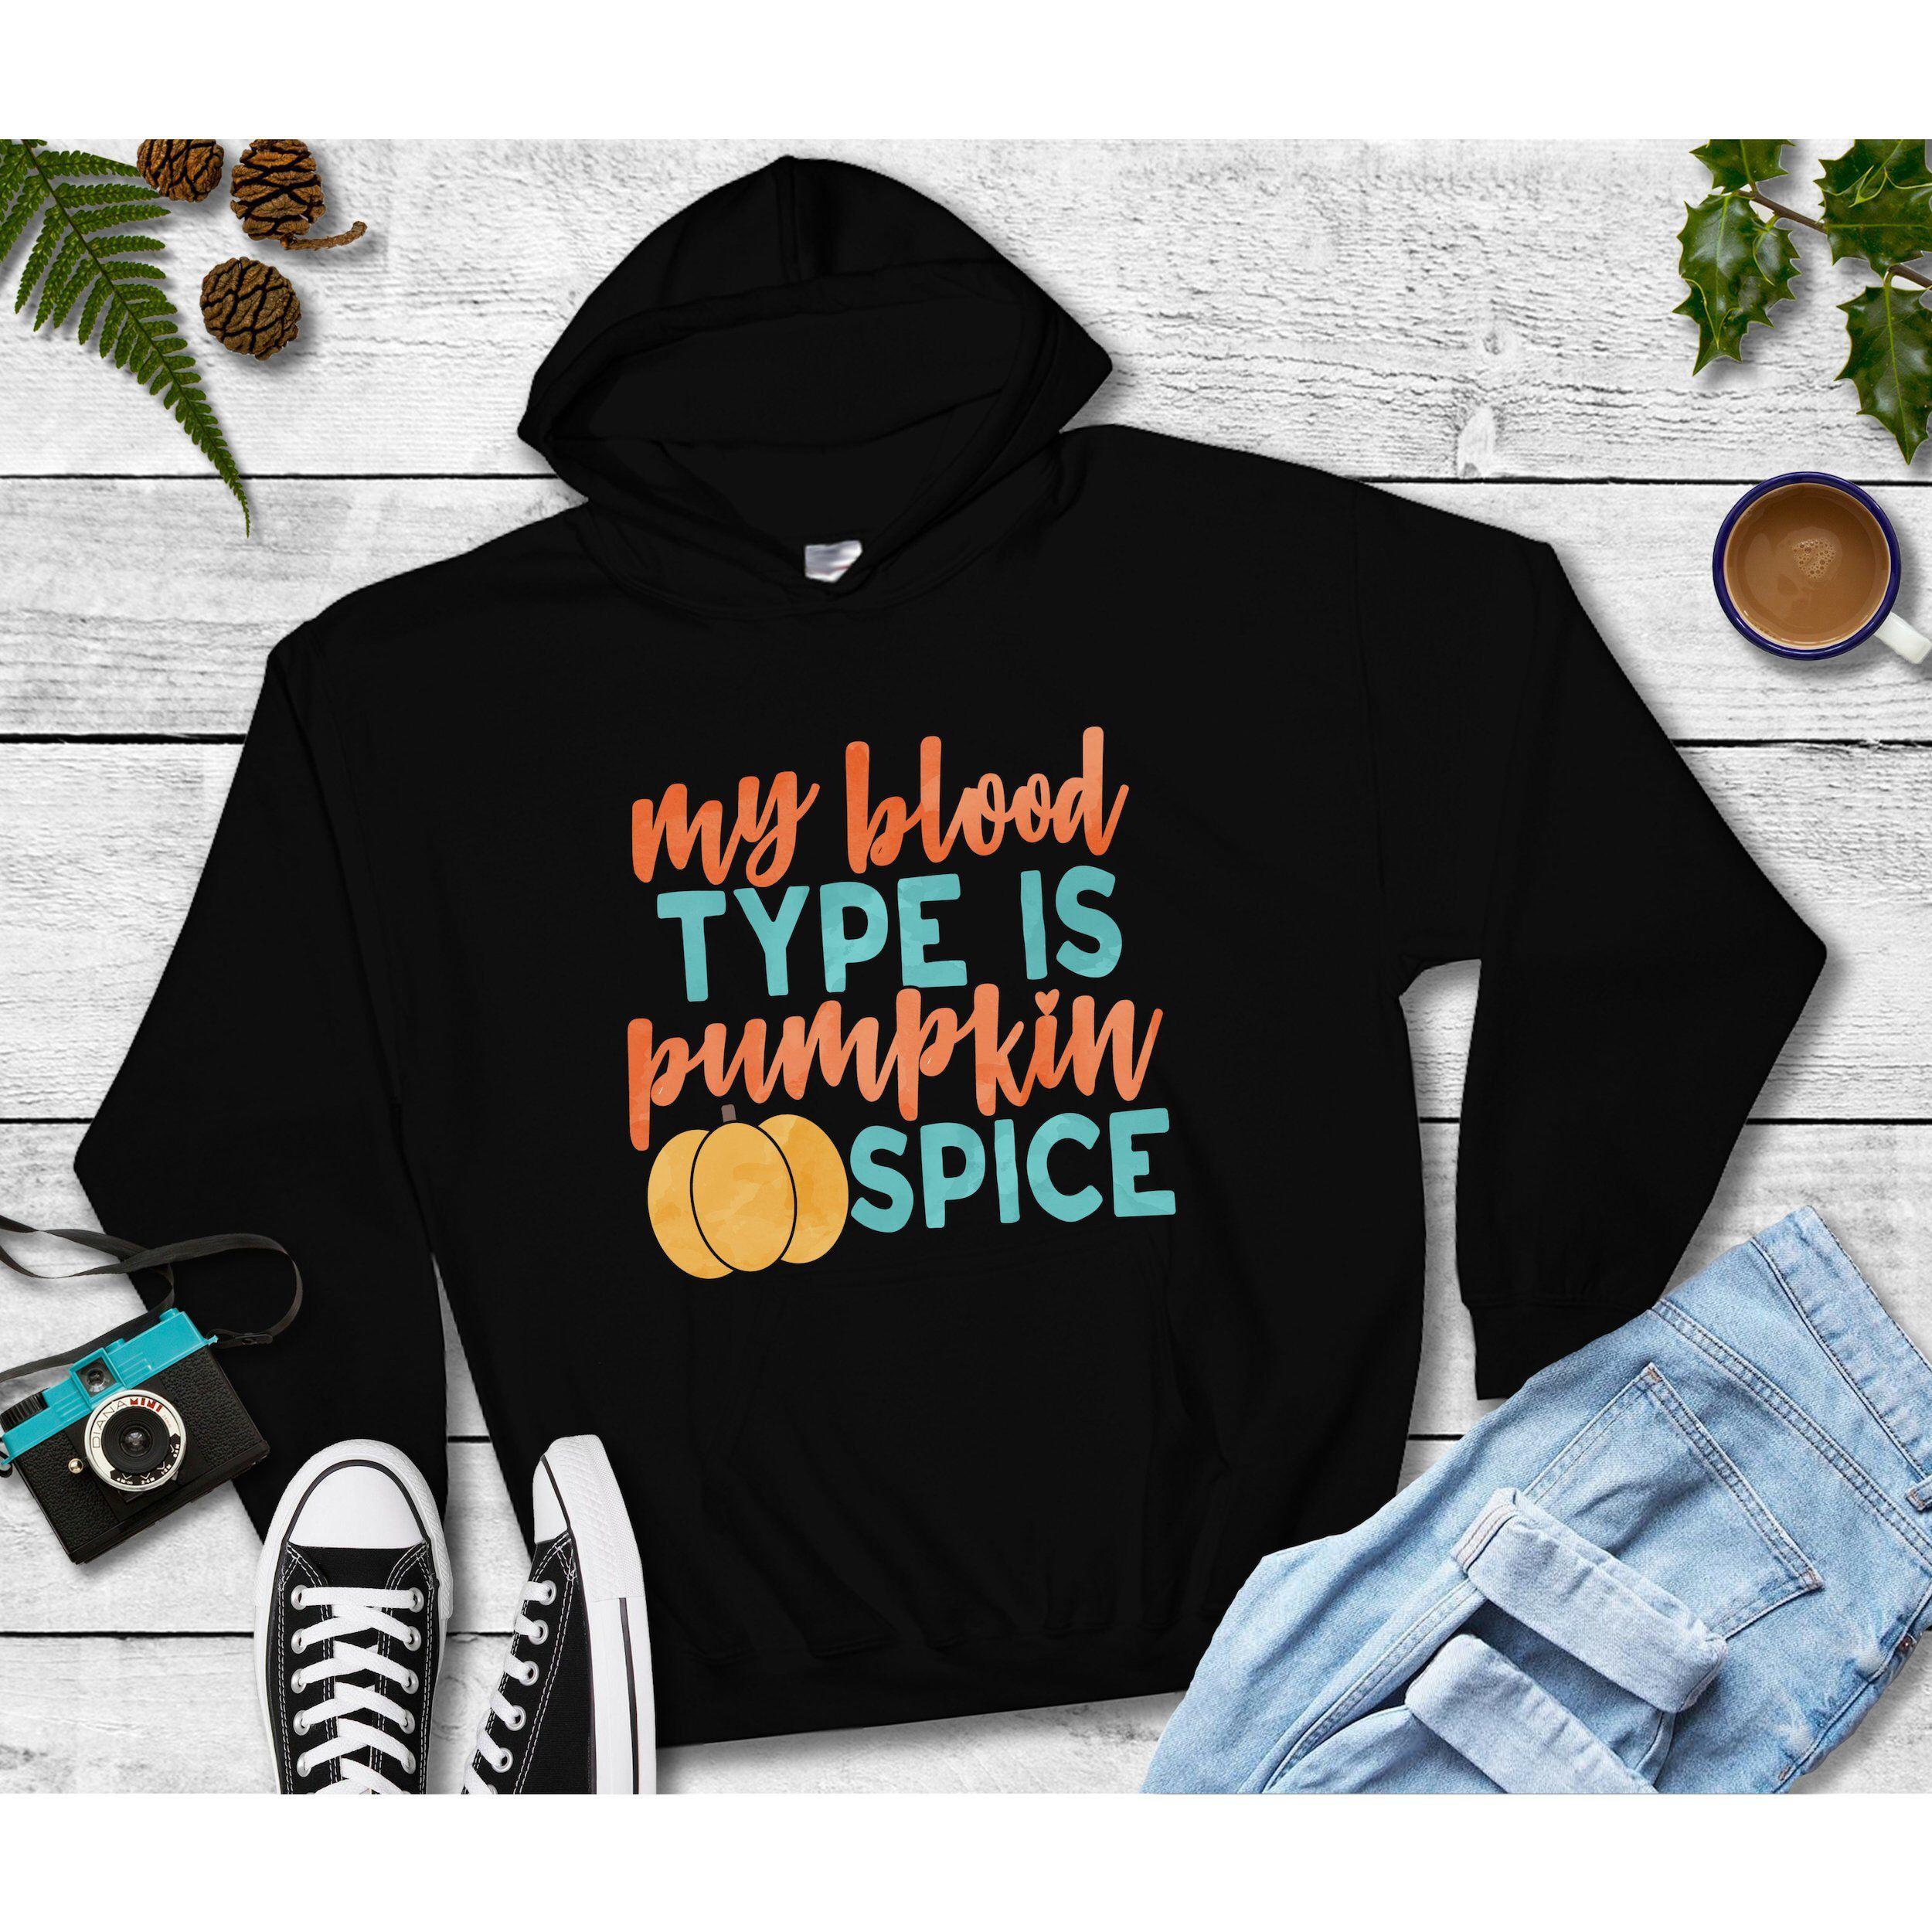 Autumn Clothes Quotes Custom Fall Sayings Hooded Sweatshirt Cute Fall Shirt Autumn Design Fall Clothes Design Comfortable Sweats Fall Shirts Hooded Sweatshirts Outfit Quotes [ 2500 x 2500 Pixel ]